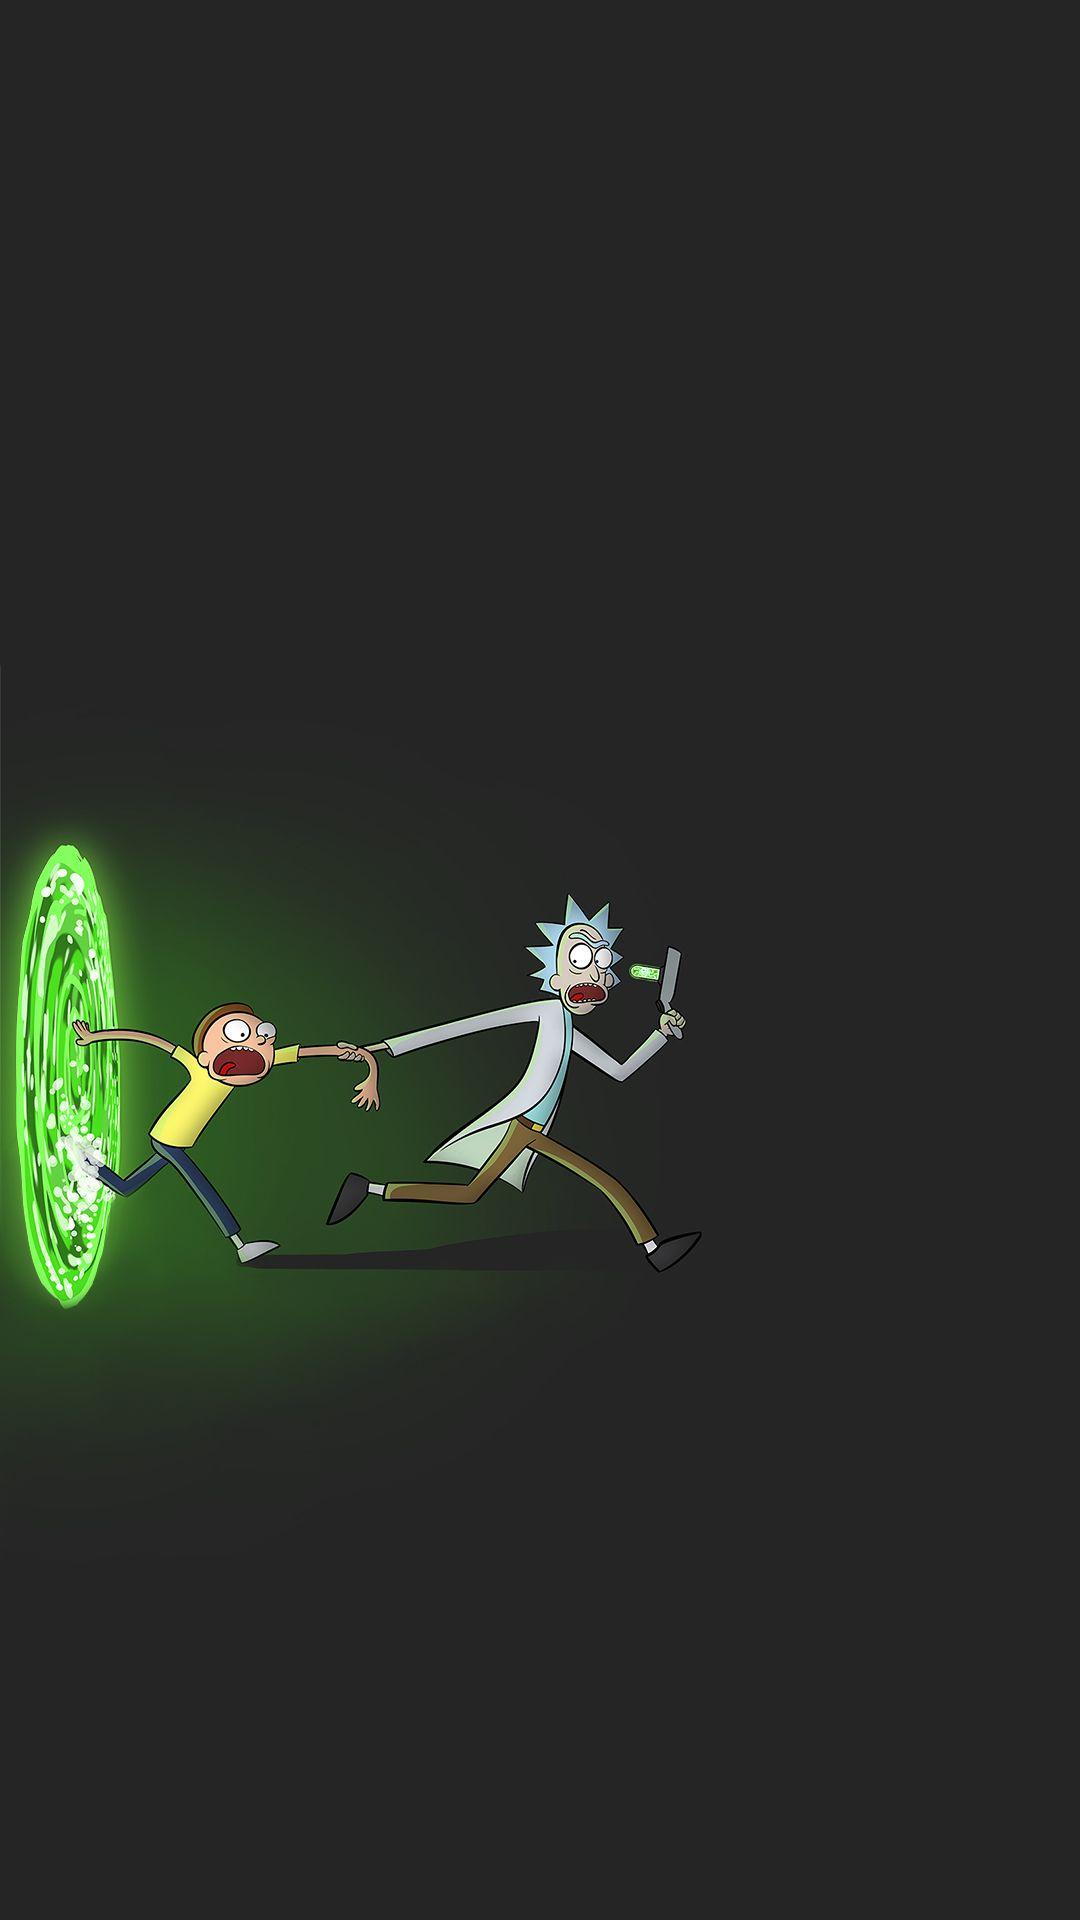 Rick Morty Rick And Morty Characters Rick And Morty Poster Rick I Morty